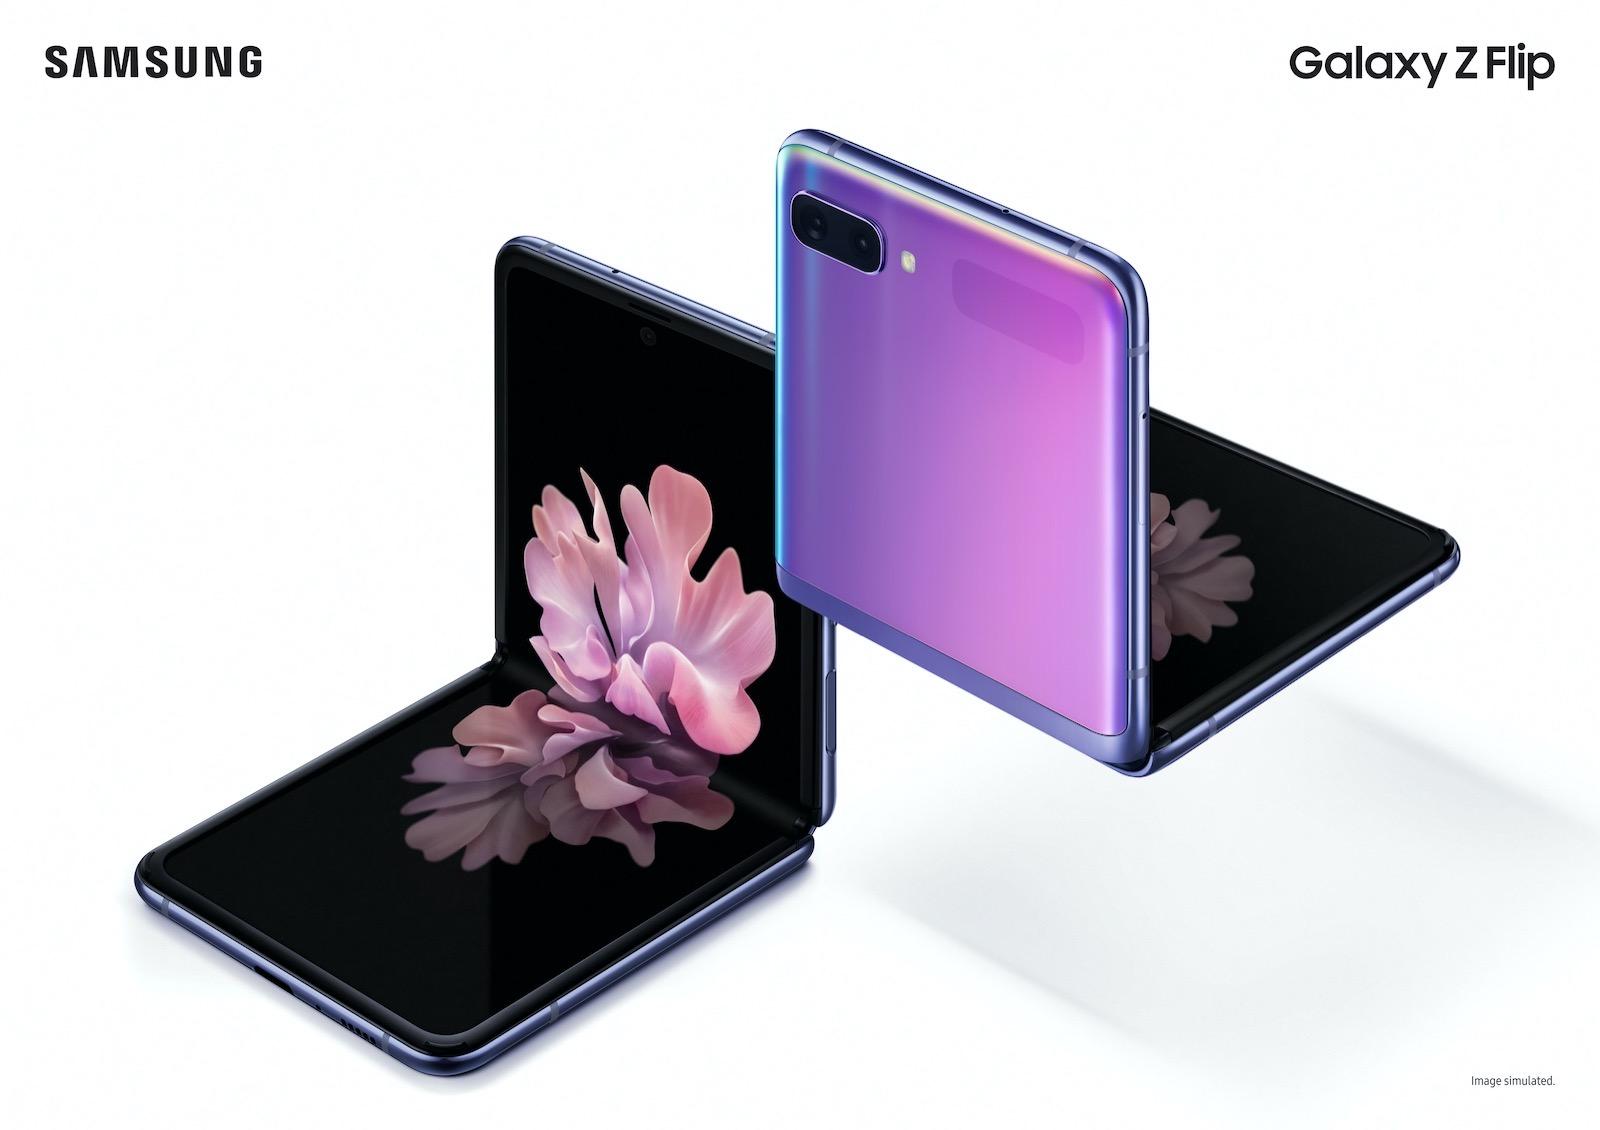 galaxy-z-flip_main-kv_purple-mirror_2p_rgb_191223.jpg